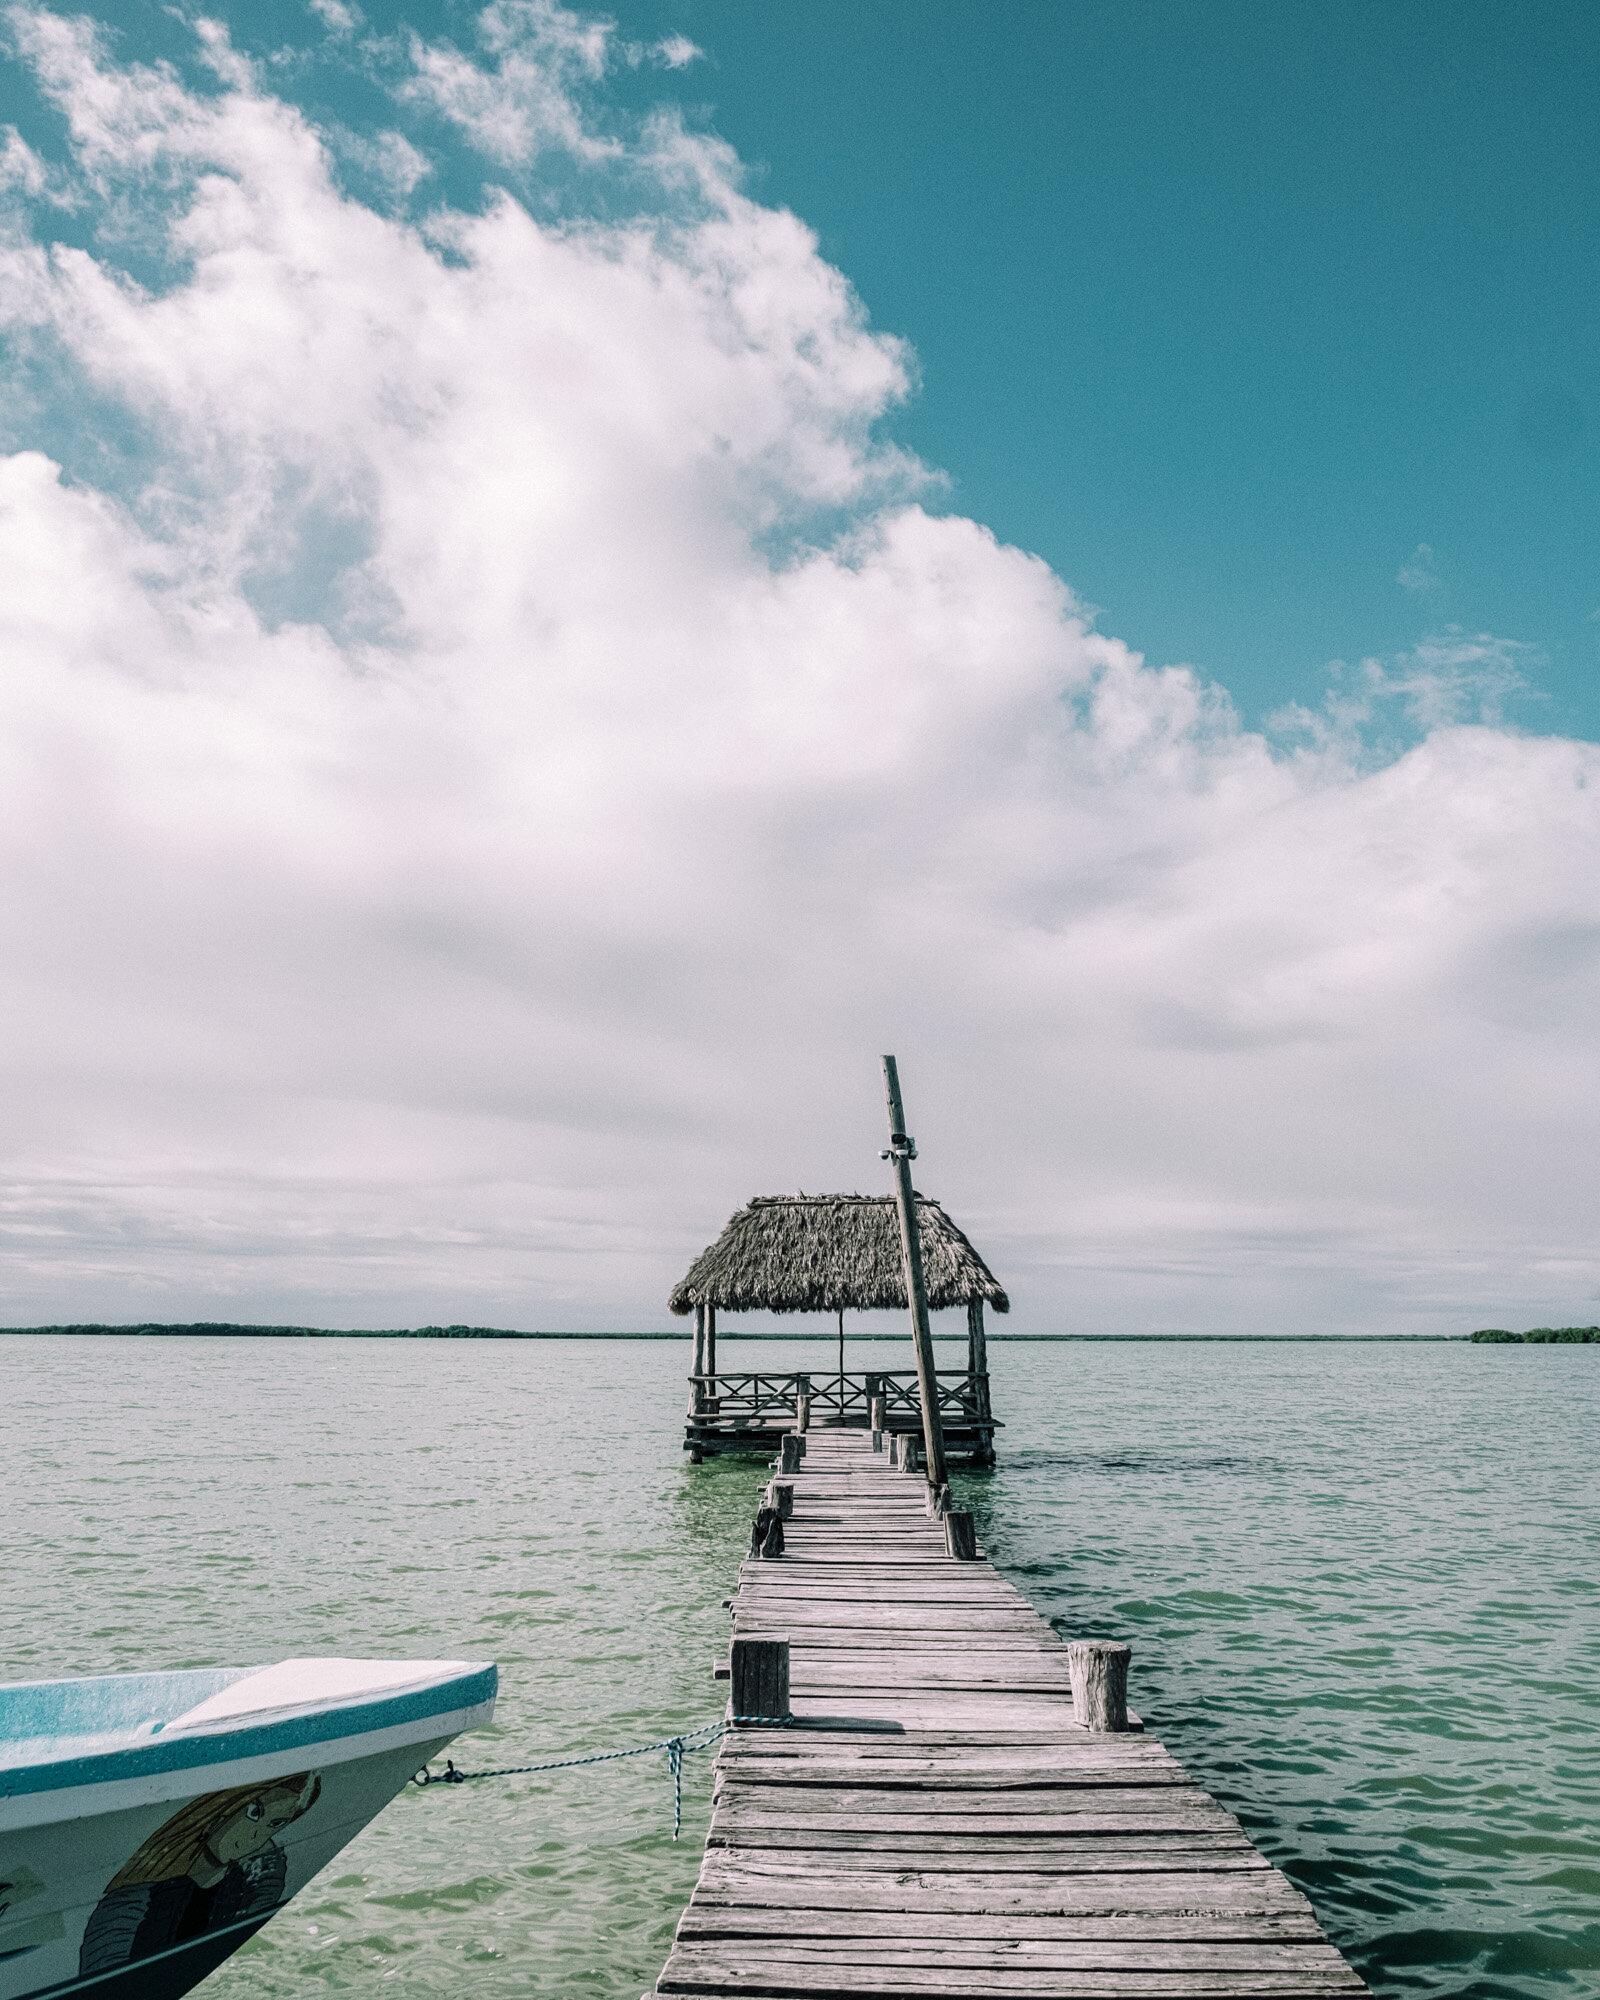 Rachel Off Duty: Sian Ka'an Reserve and Punta Allen, Mexico